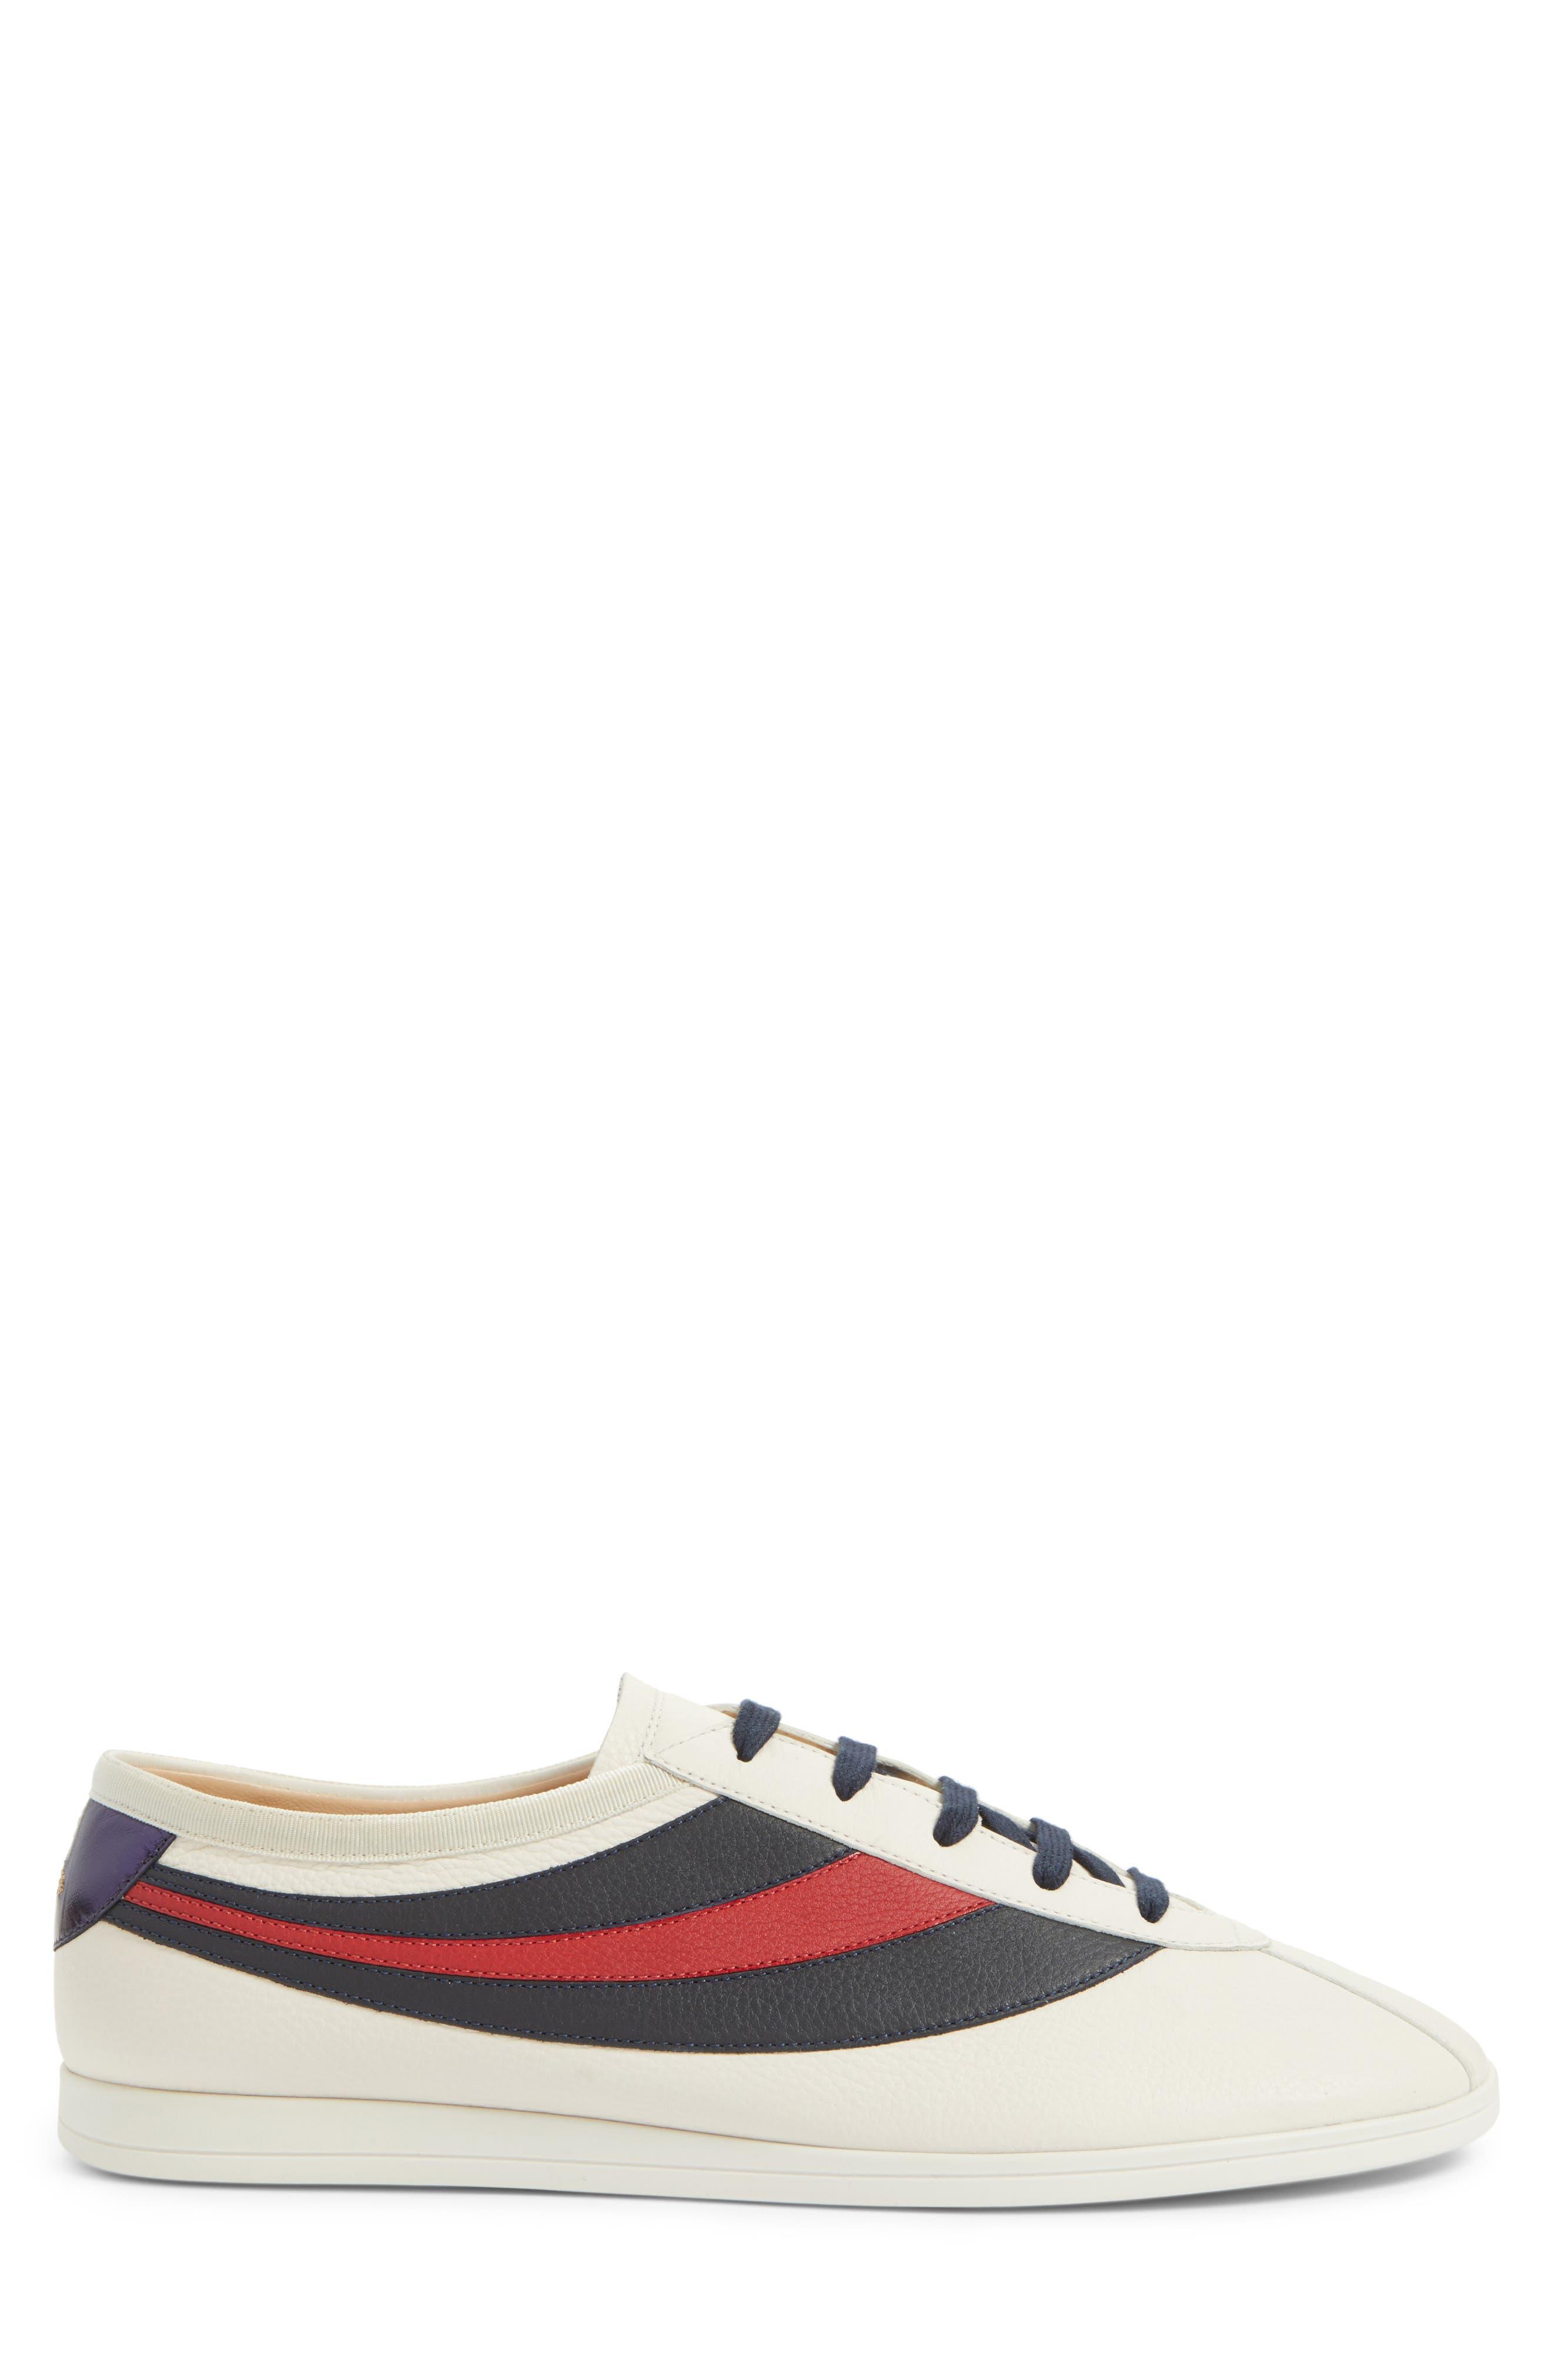 Alternate Image 3  - Gucci Falacer Sneaker (Men)